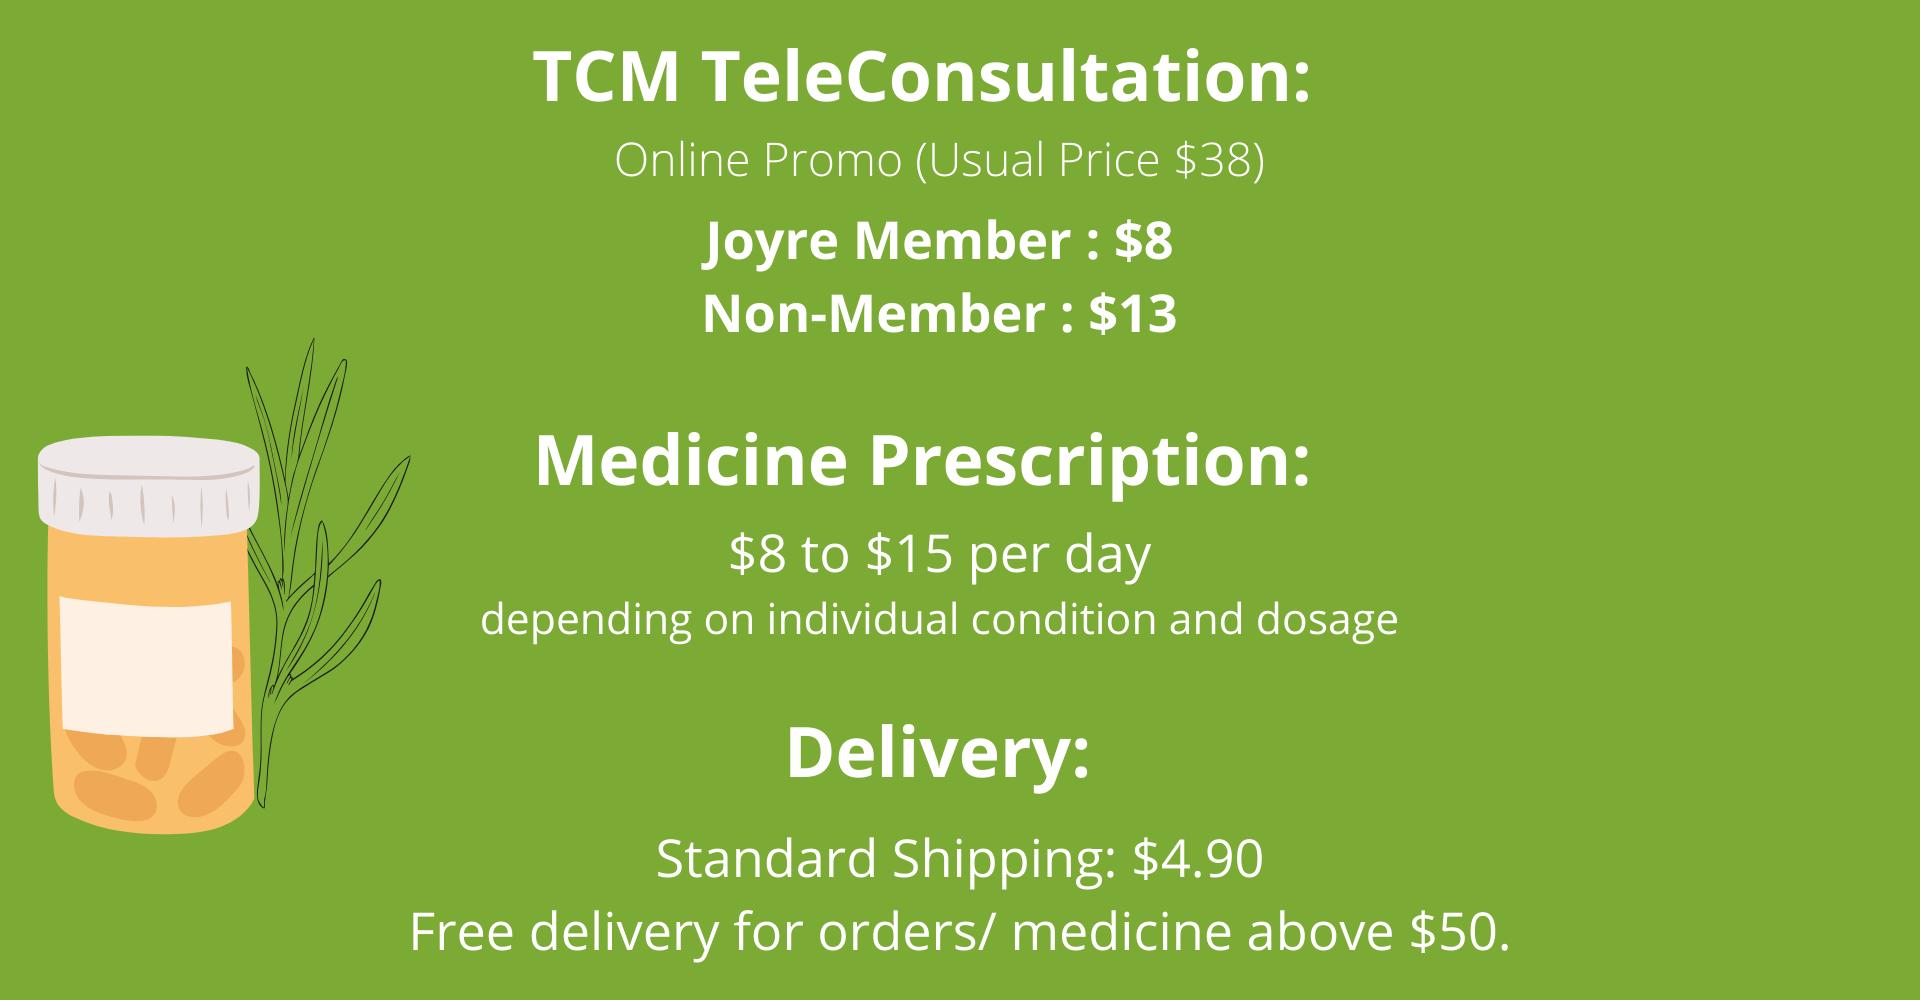 tcm teleconsult fees